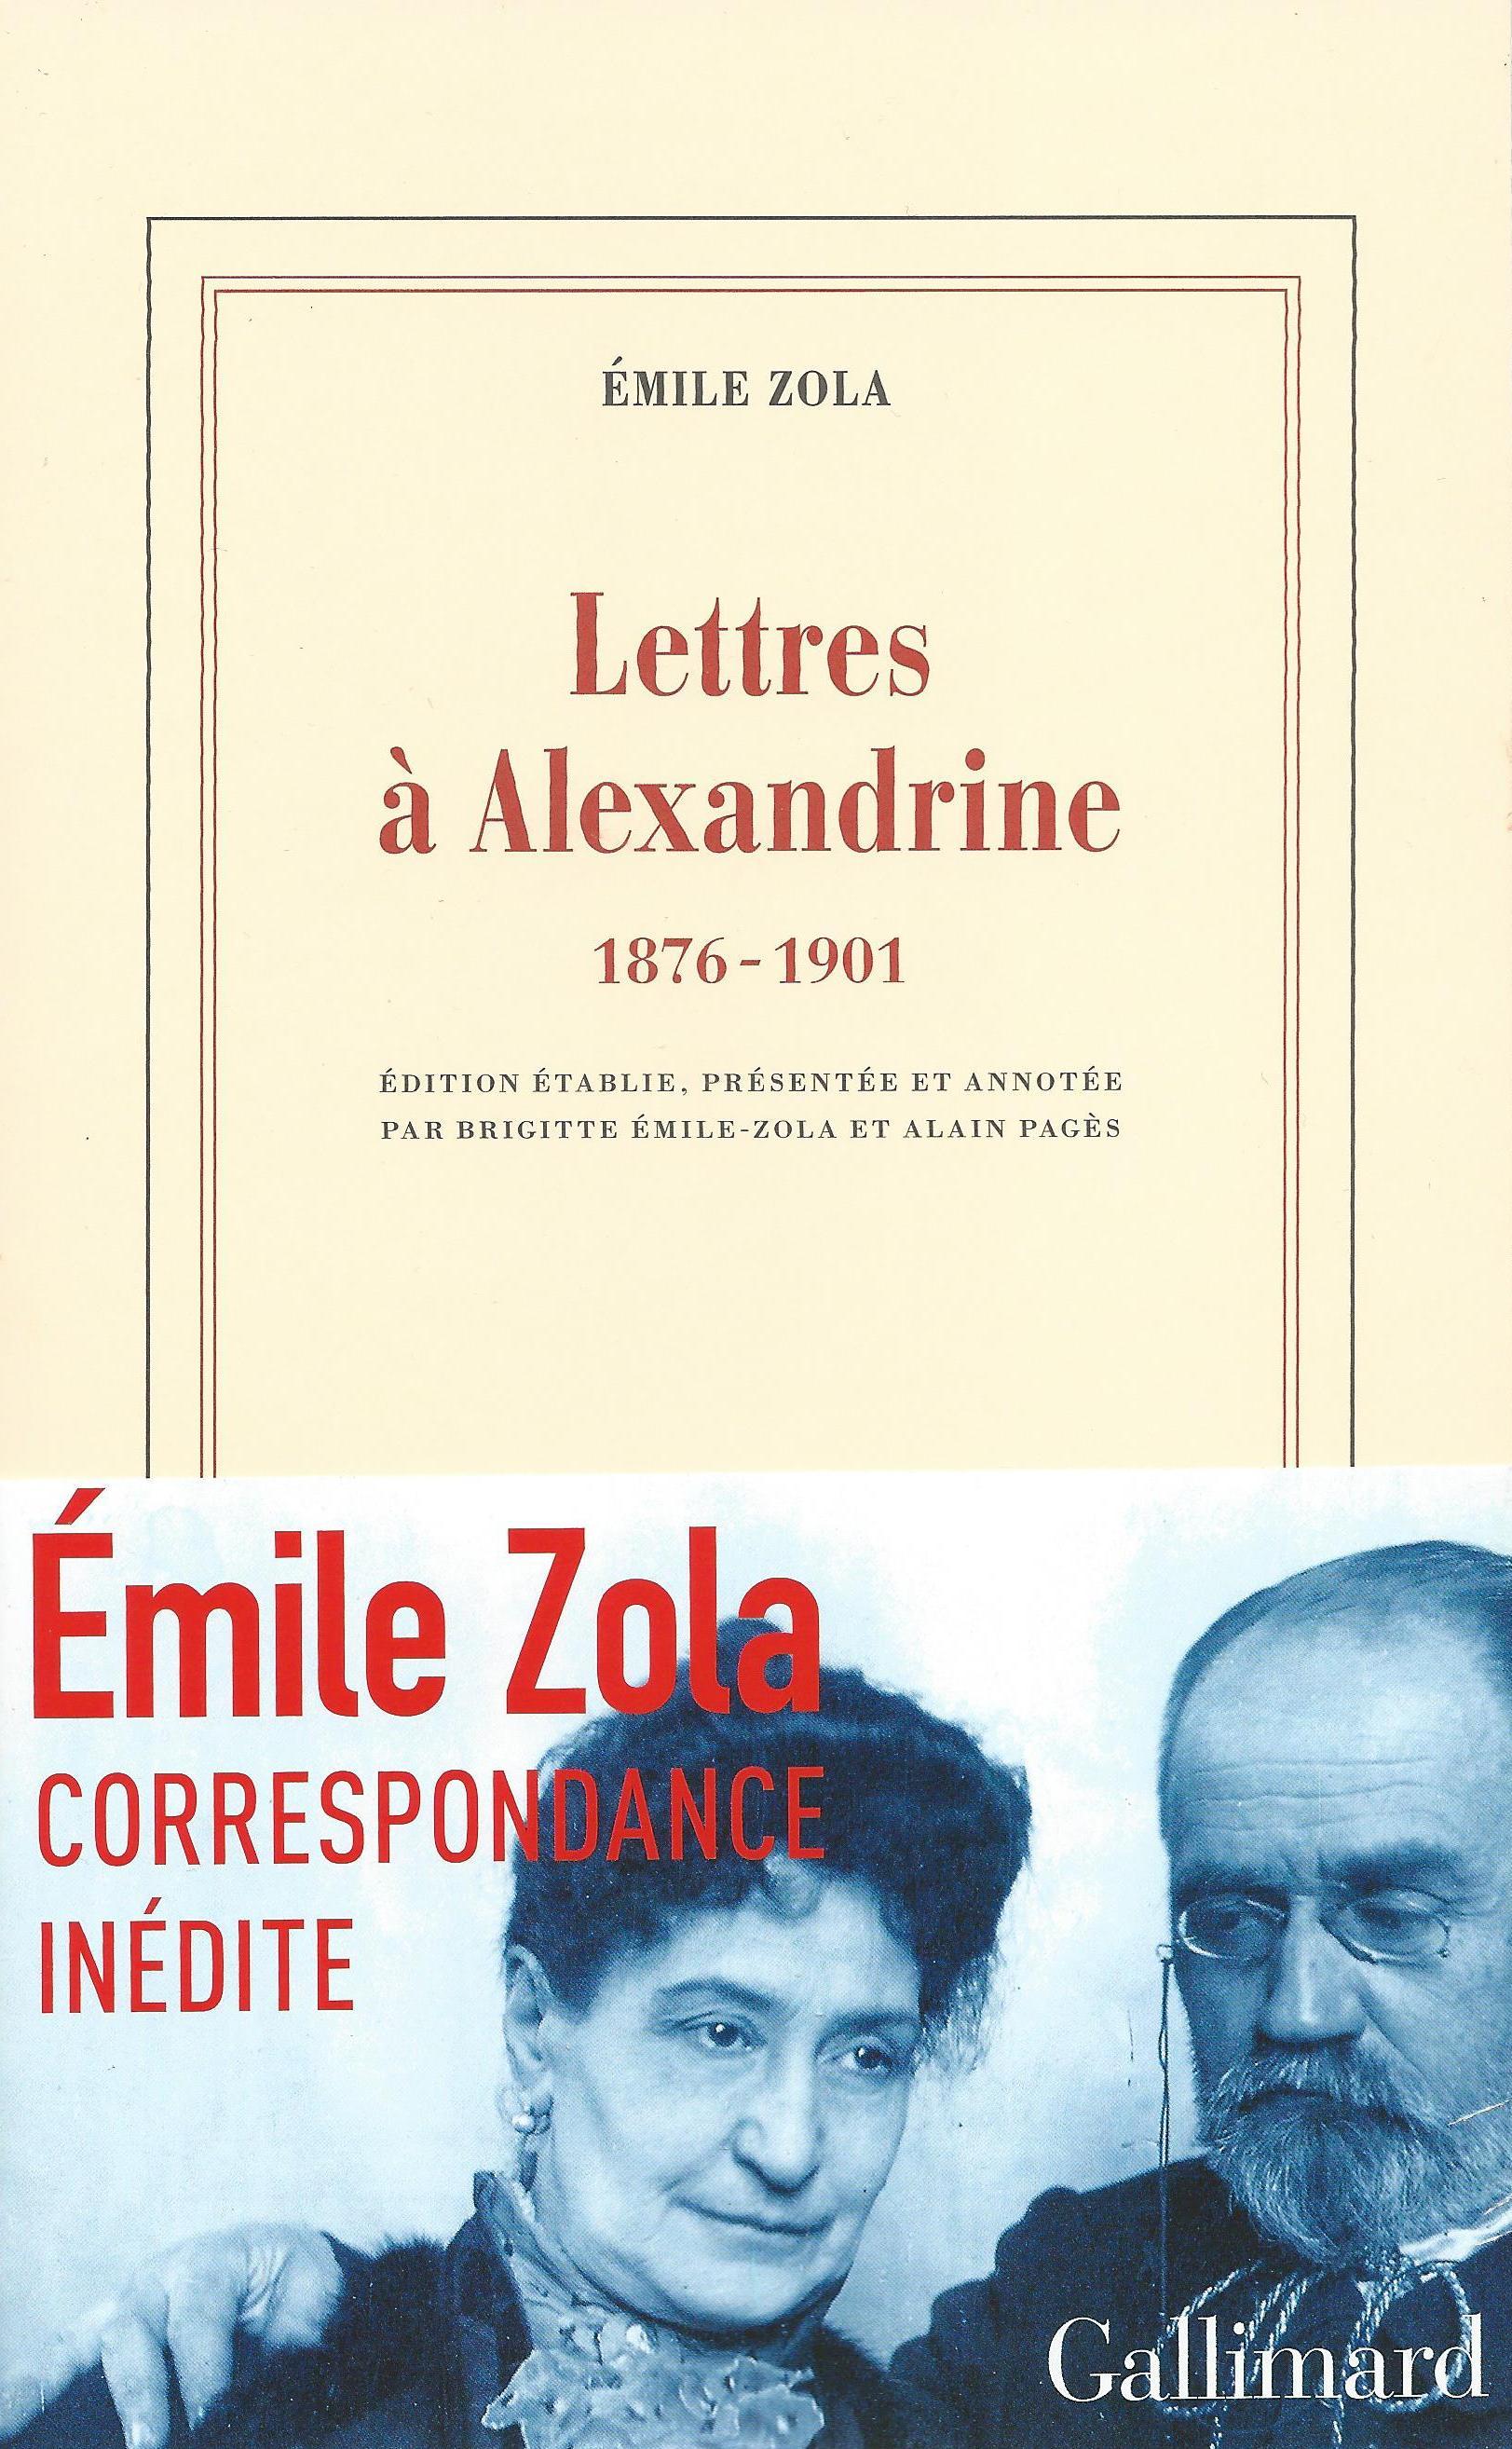 É. Zola, Lettres à Alexandrine (1876-1901)